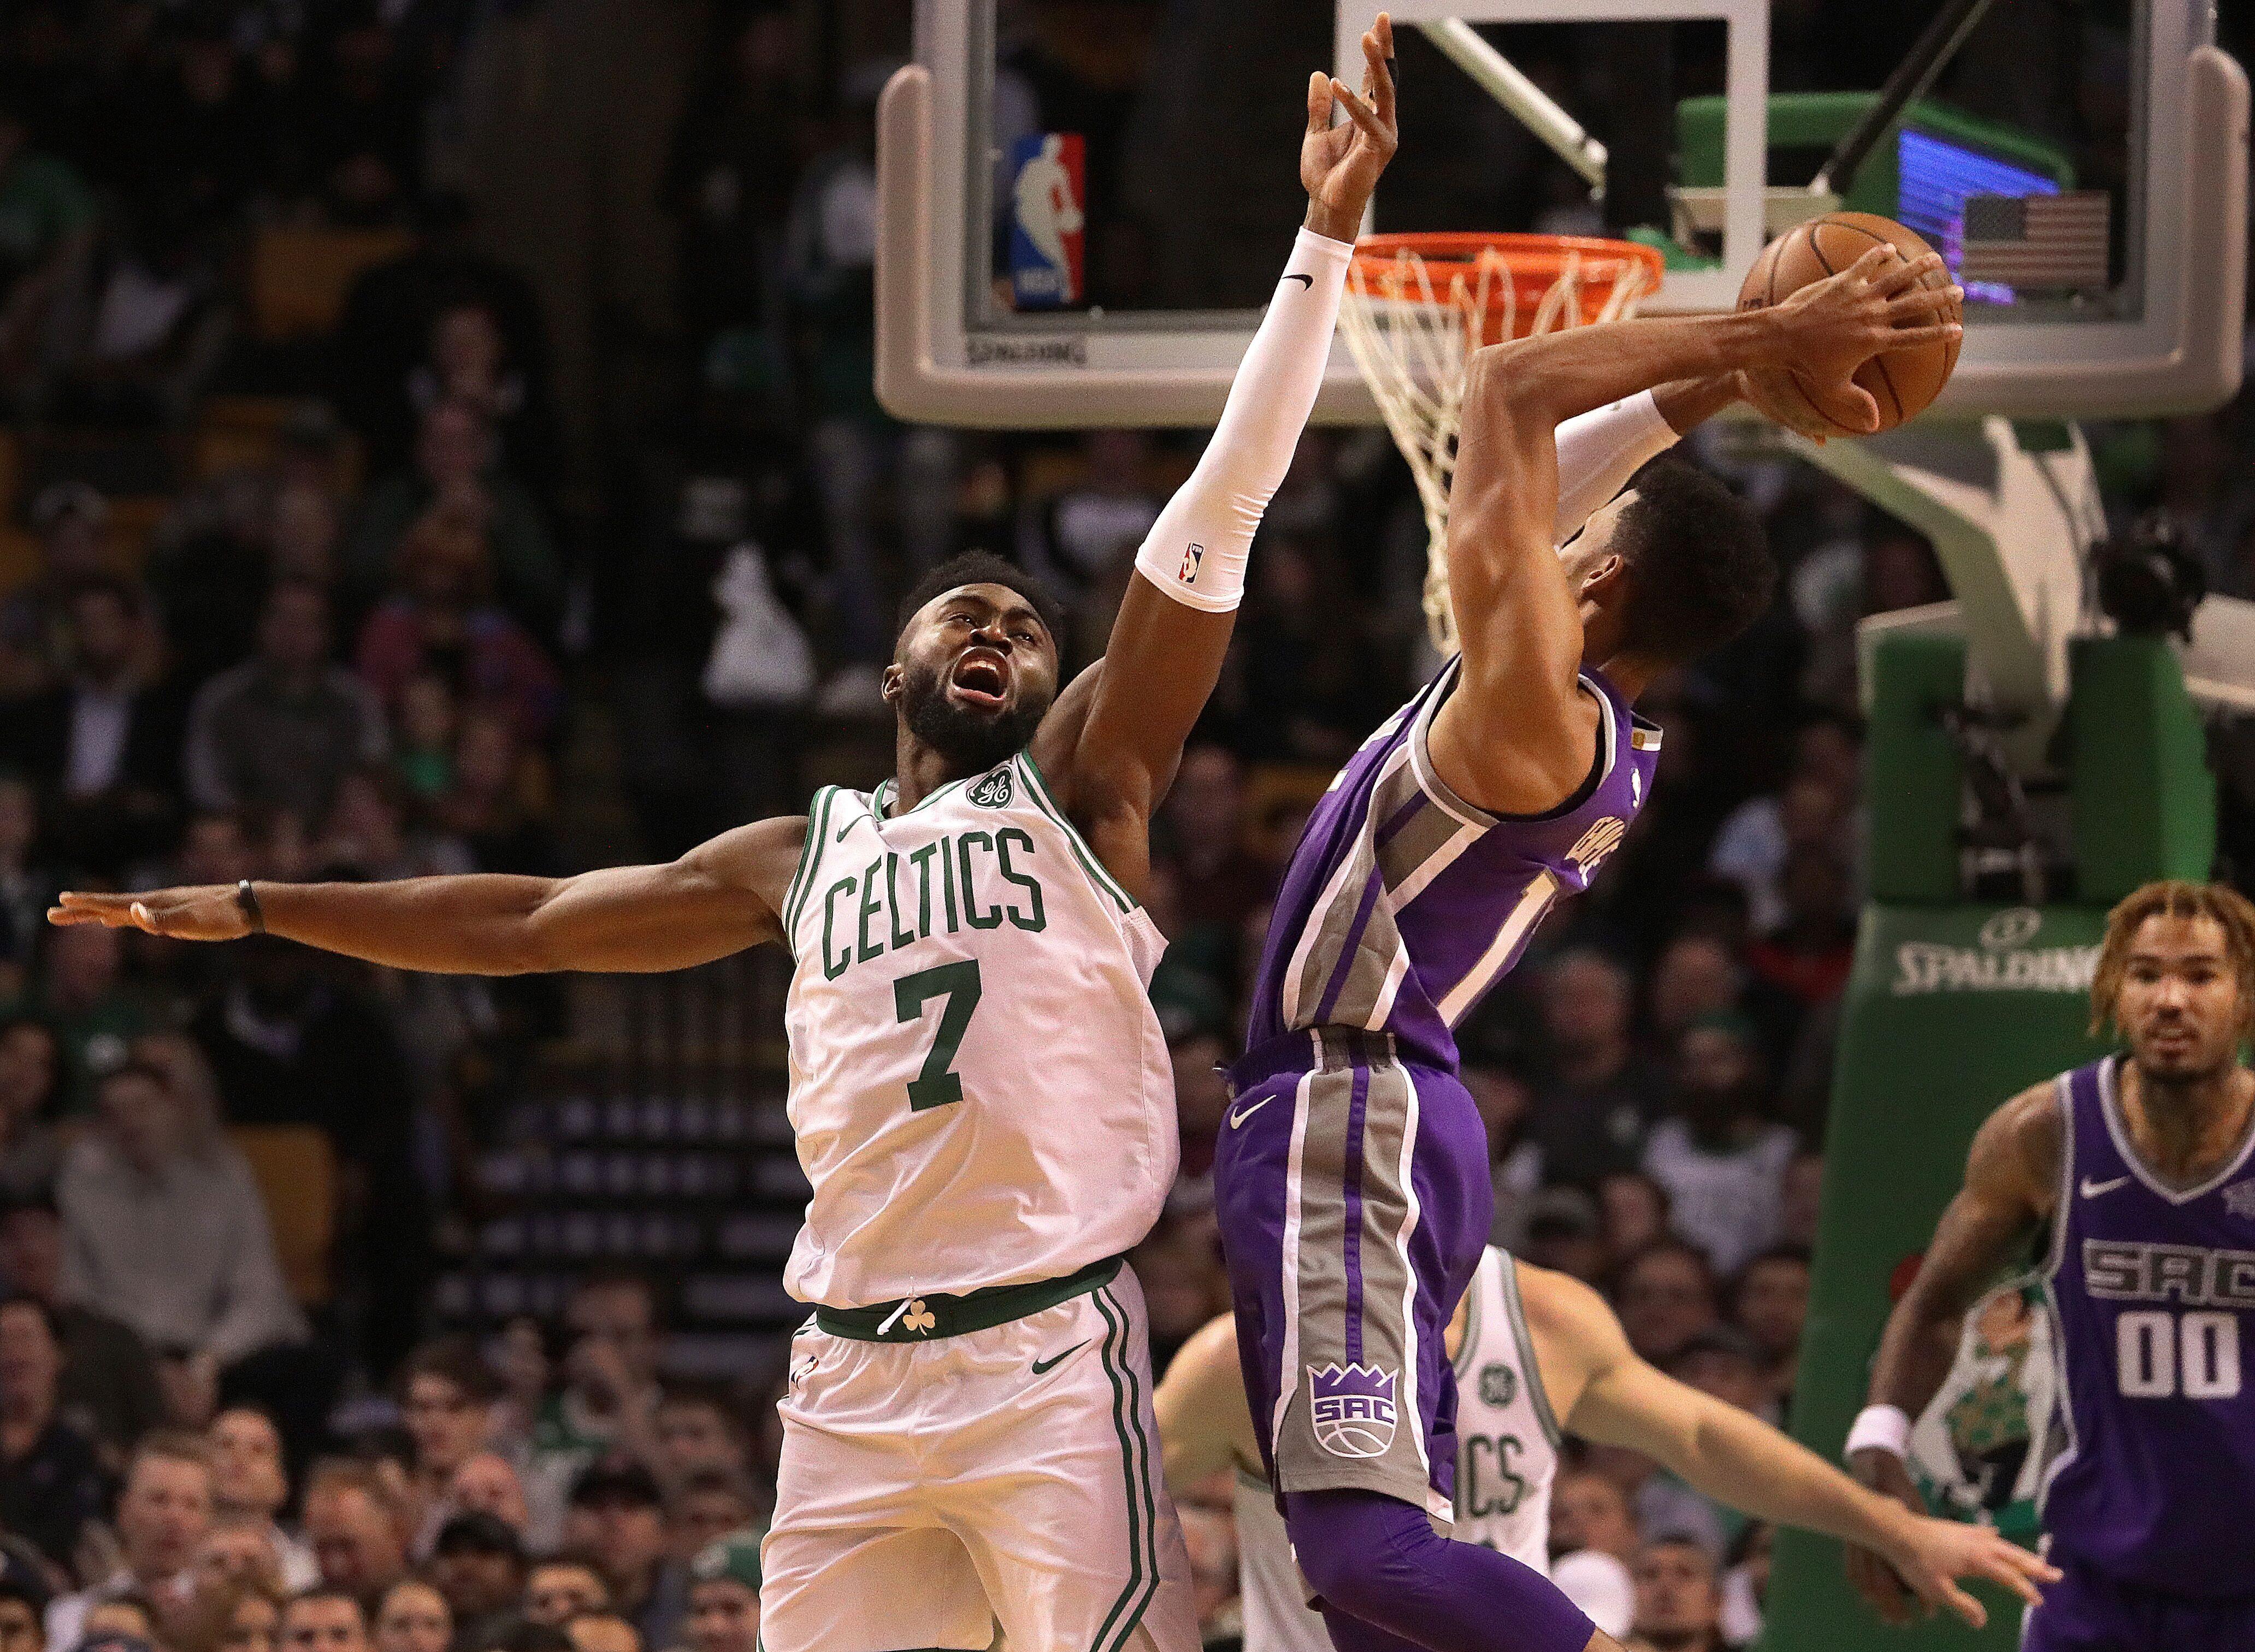 Celtics Vs Kings Image: Boston Celtics Cannot Change Approach Against Kings